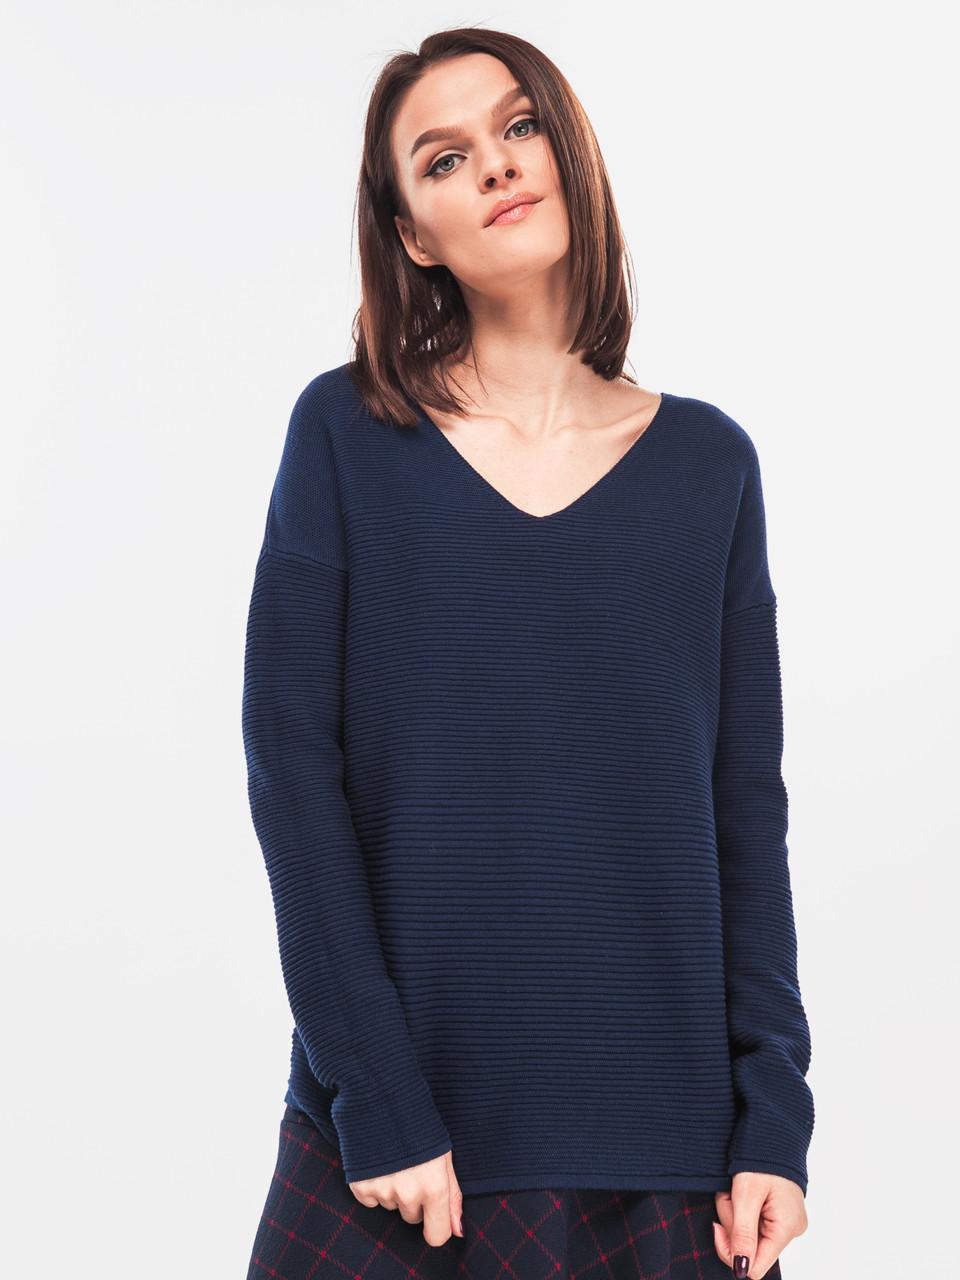 Пуловер Tom Tailor 1008633 M Синий